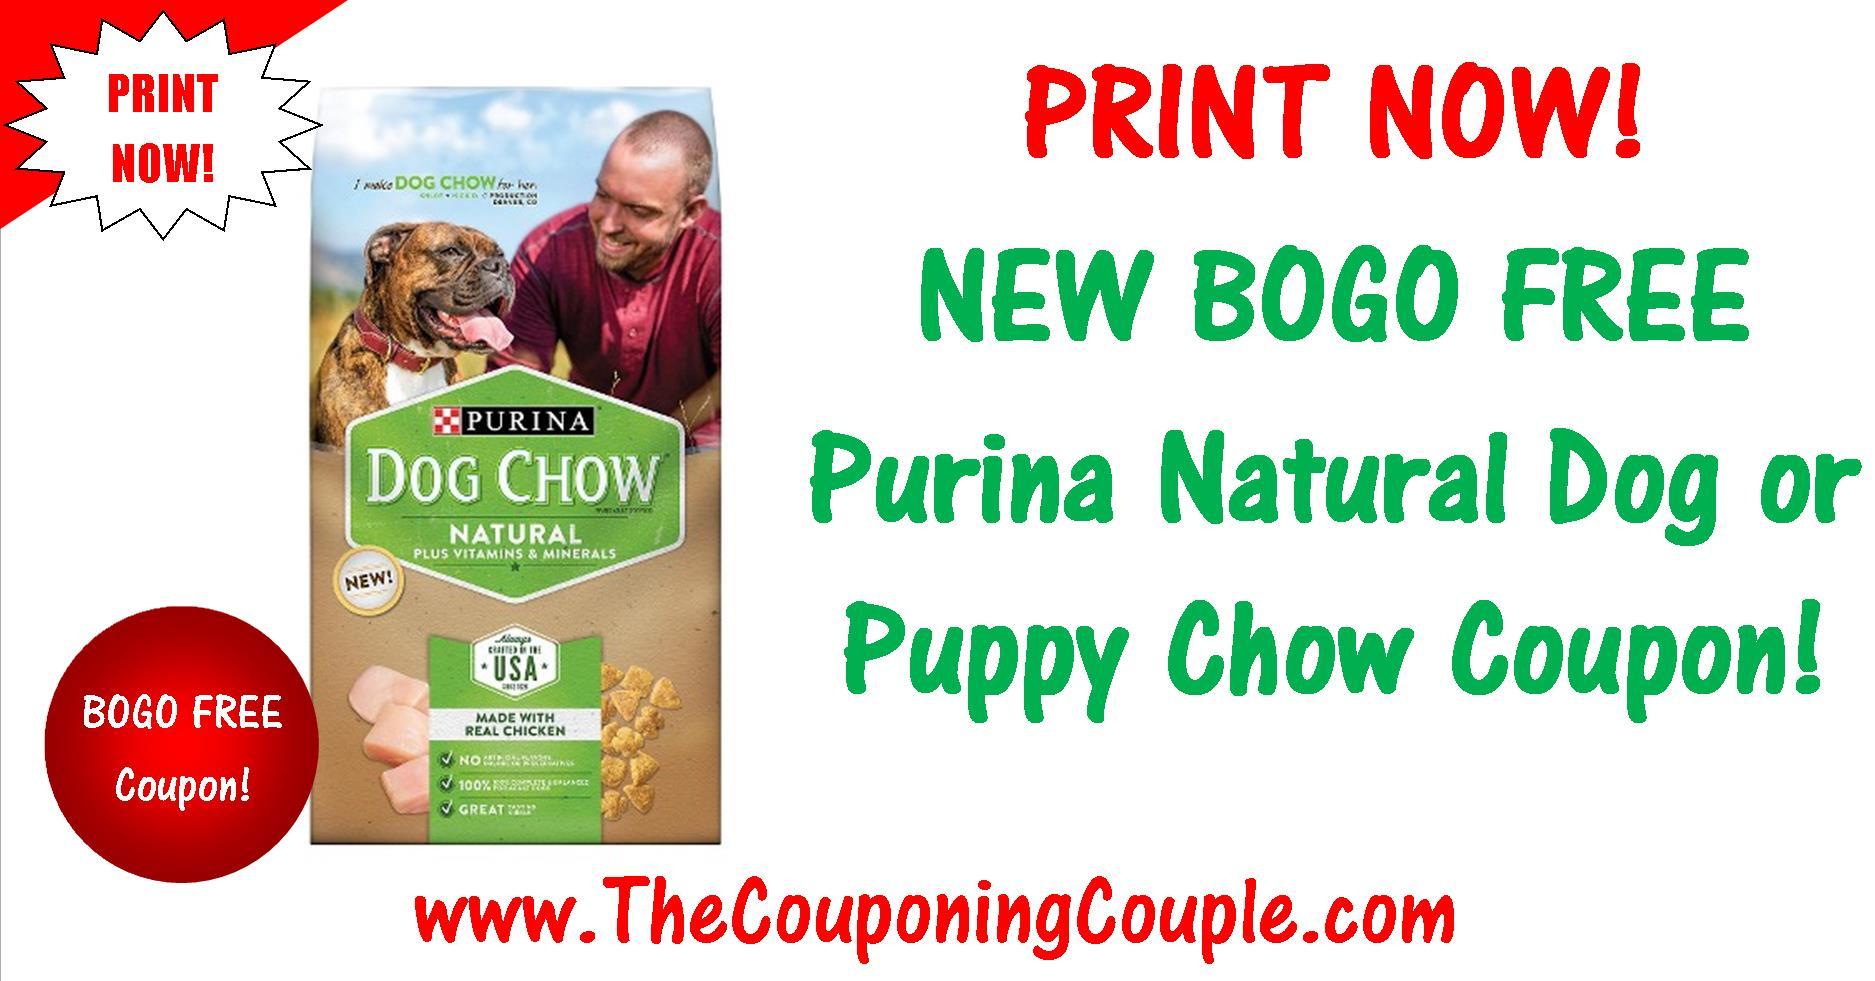 New Bogo Free Purina Natural Printable Coupon ~ Print Now! - Bogo Free Coupons Printable